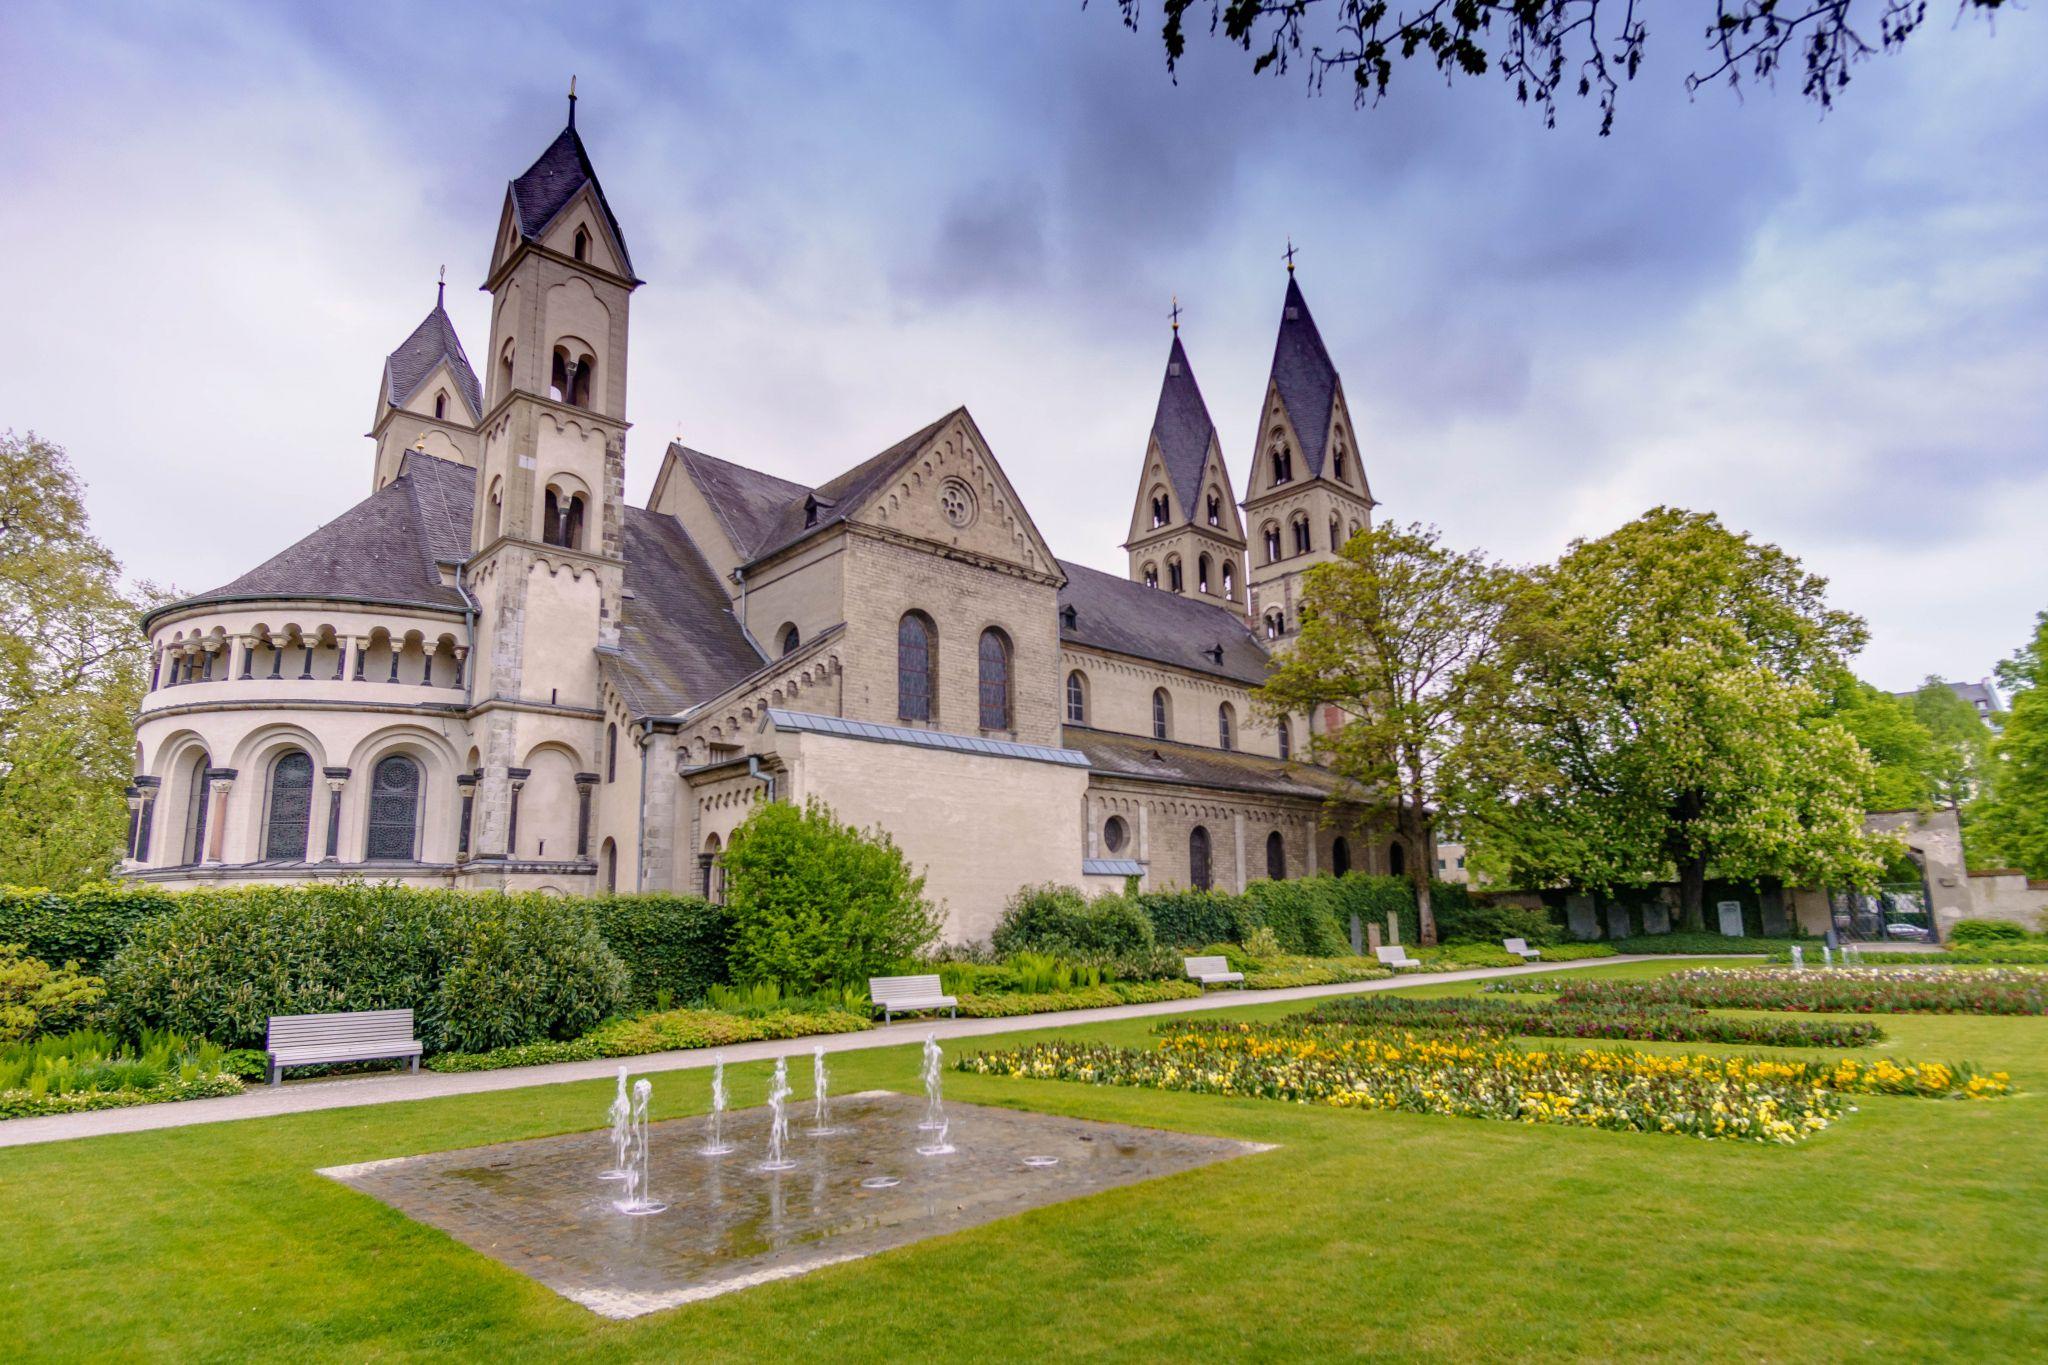 Basilika Sankt Kastor, Germany